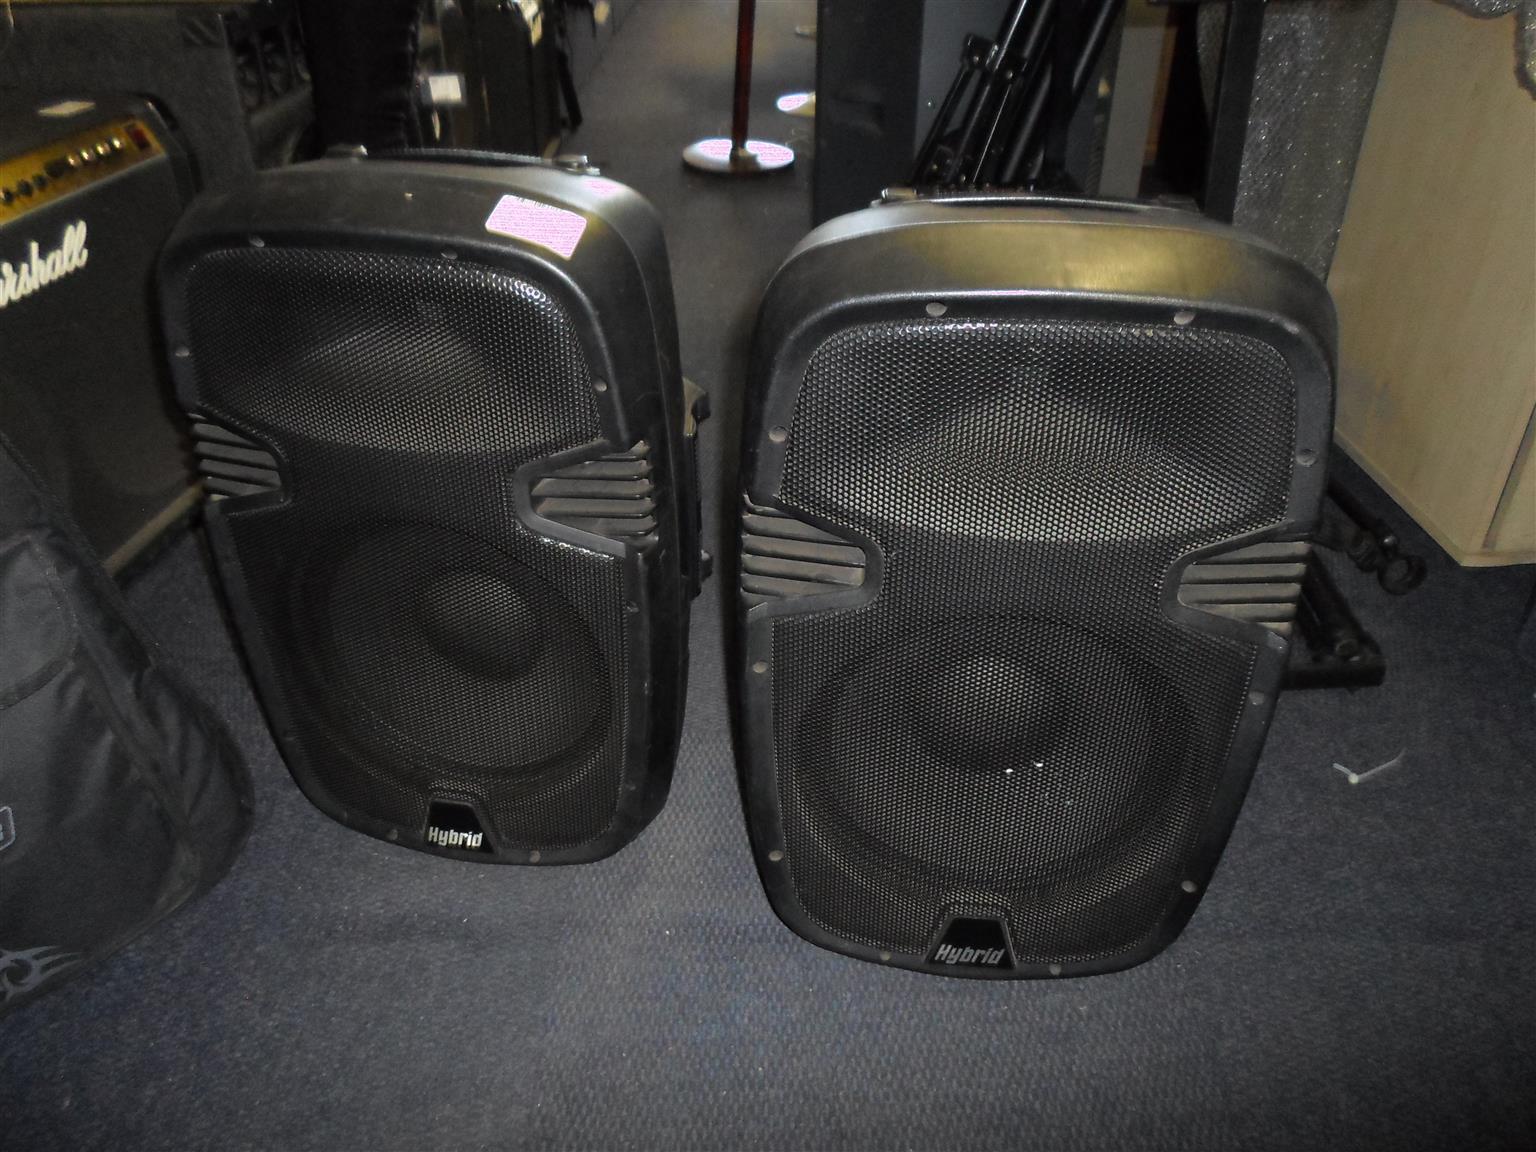 Hybrid PM-12 Speakers